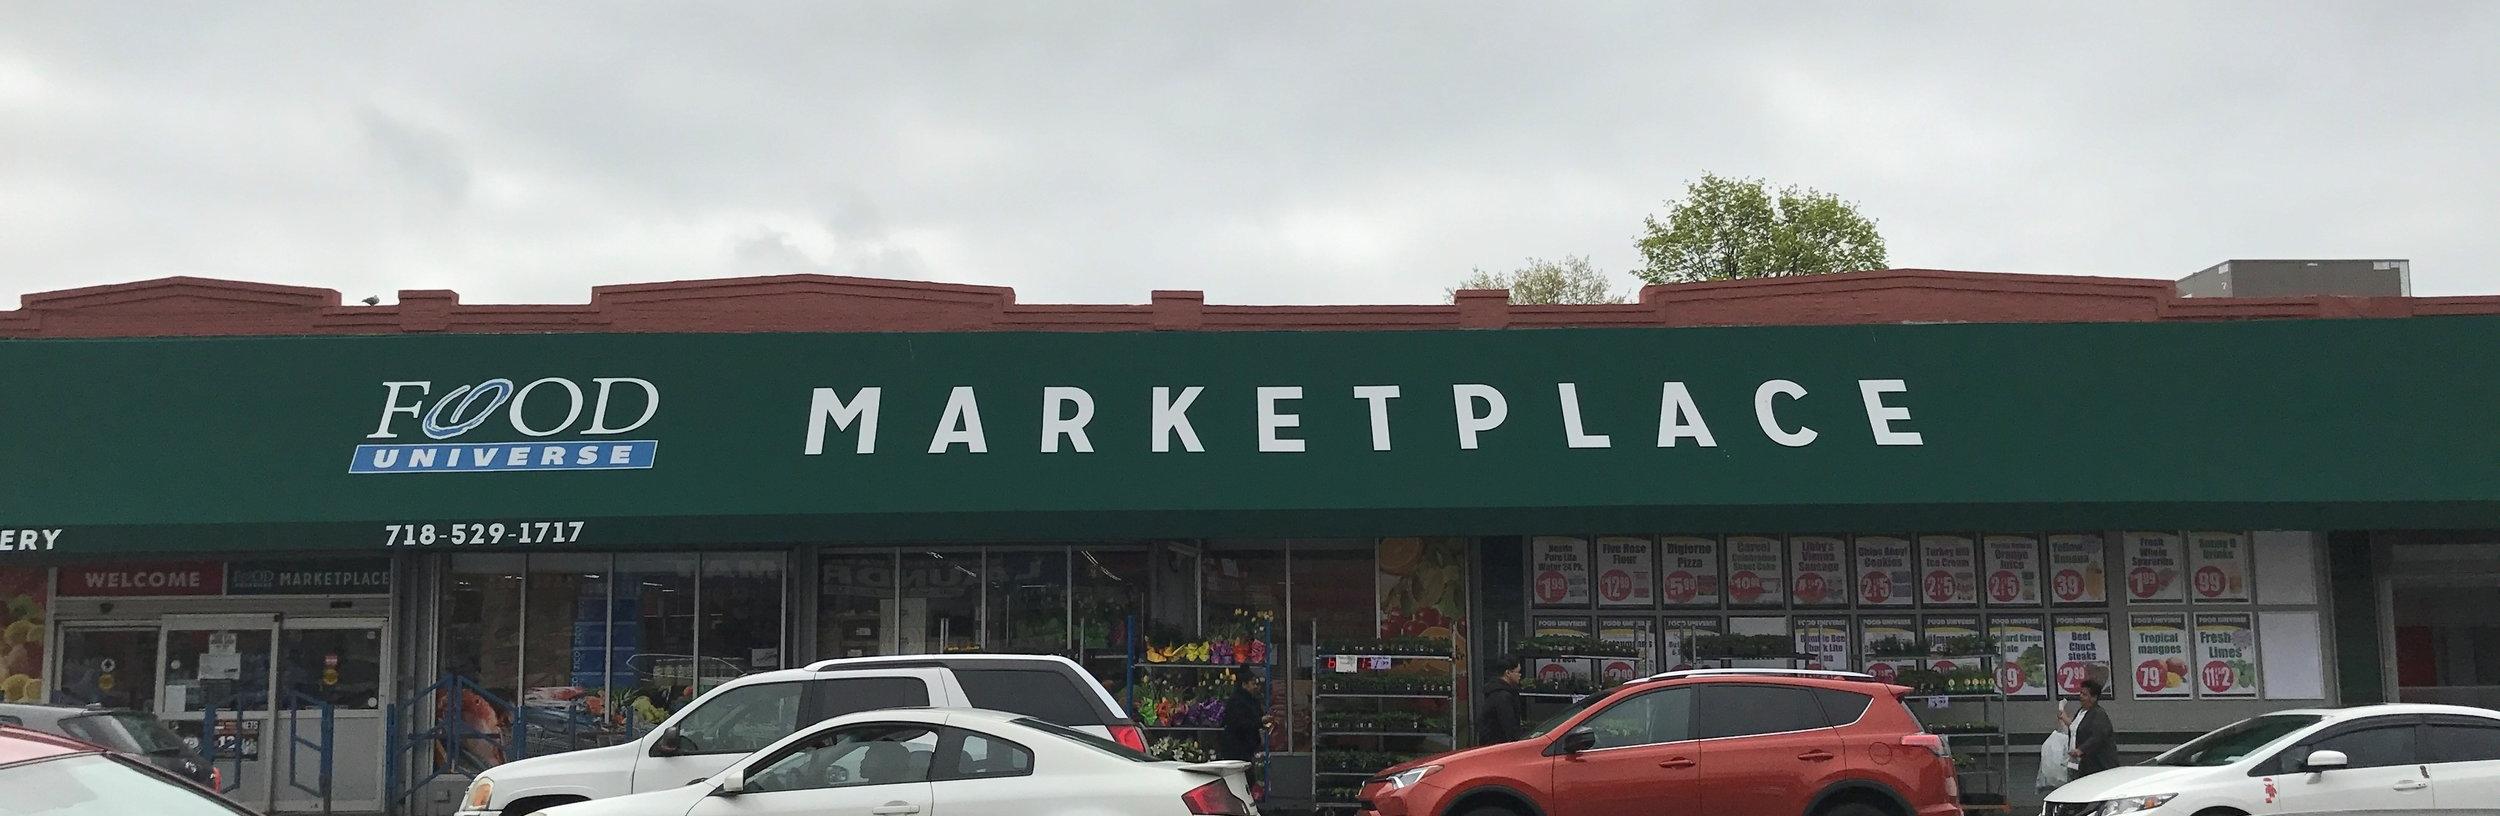 No 6B Food Universe Marketplace.jpg